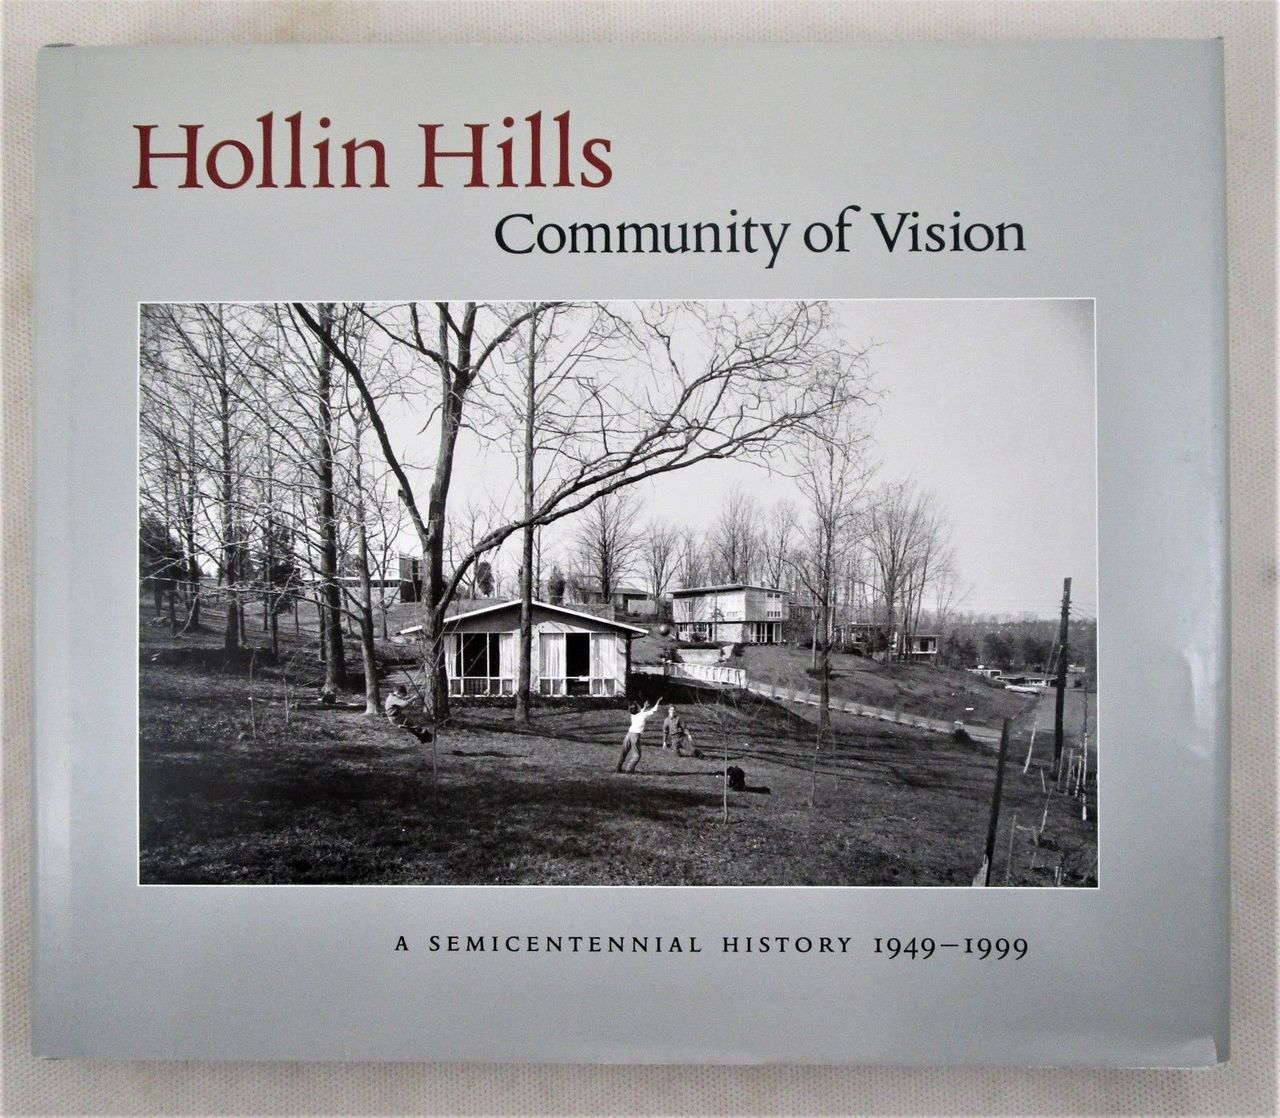 HOLLIN HILLS: COMMUNITY OF VISION - 2000